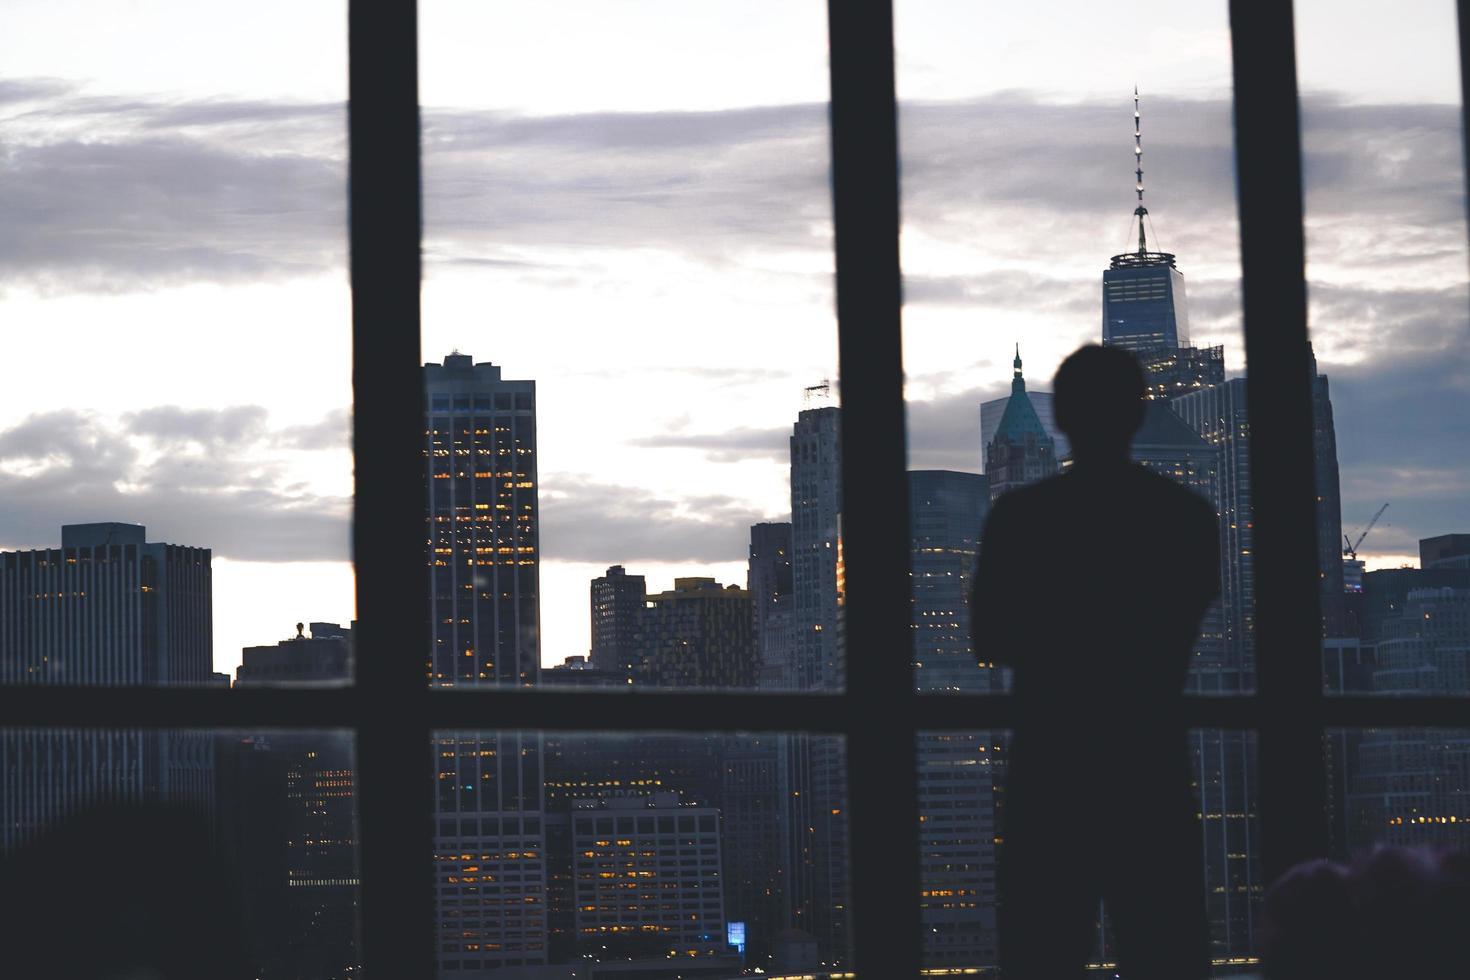 Man standing near city window photo